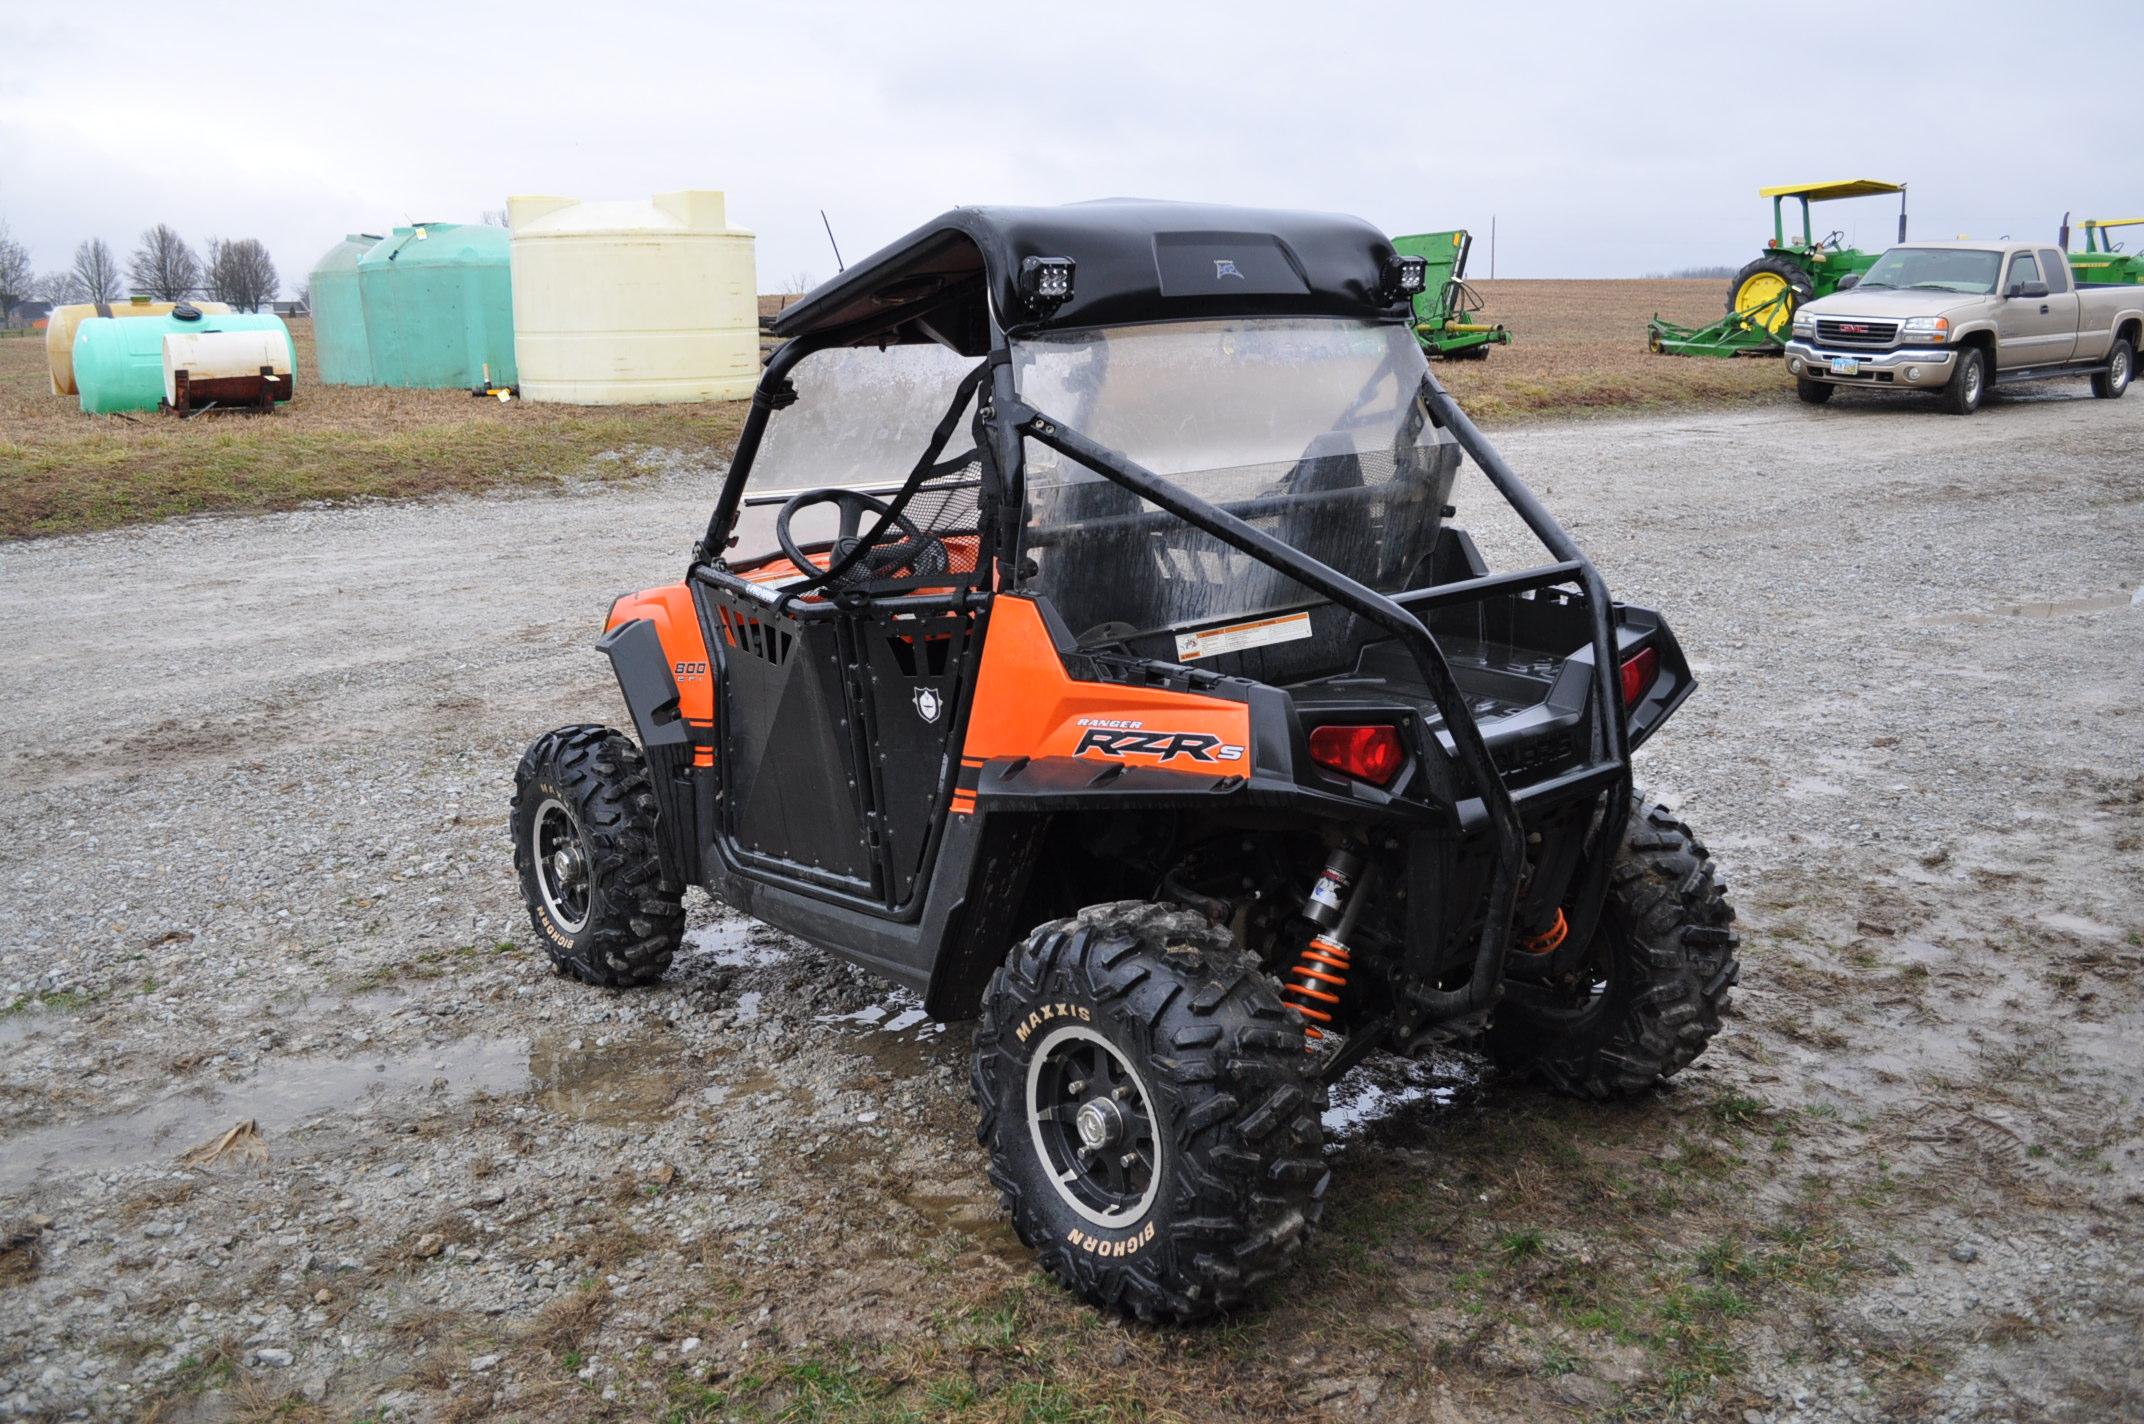 2010 Polaris Ranger RZR, 800 EFI, AT26 x 12 R 12 rear, AT26 x 9 R 12 front, half doors, 102 hrs, 899 - Image 2 of 9